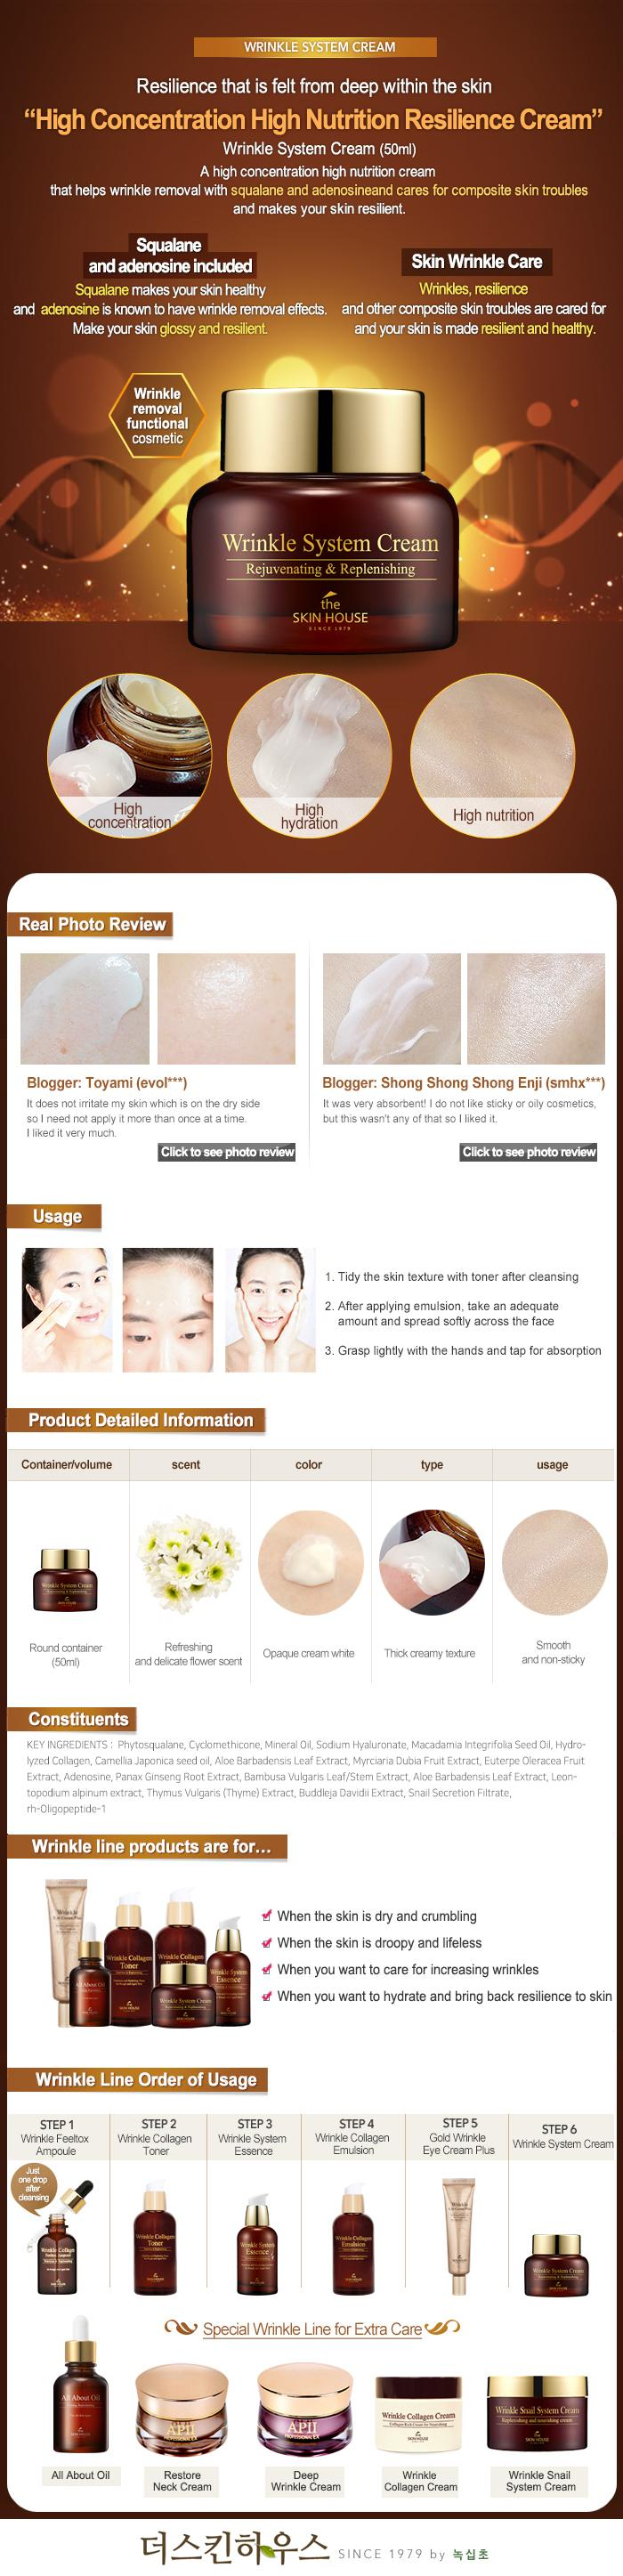 Produktinfo Bild